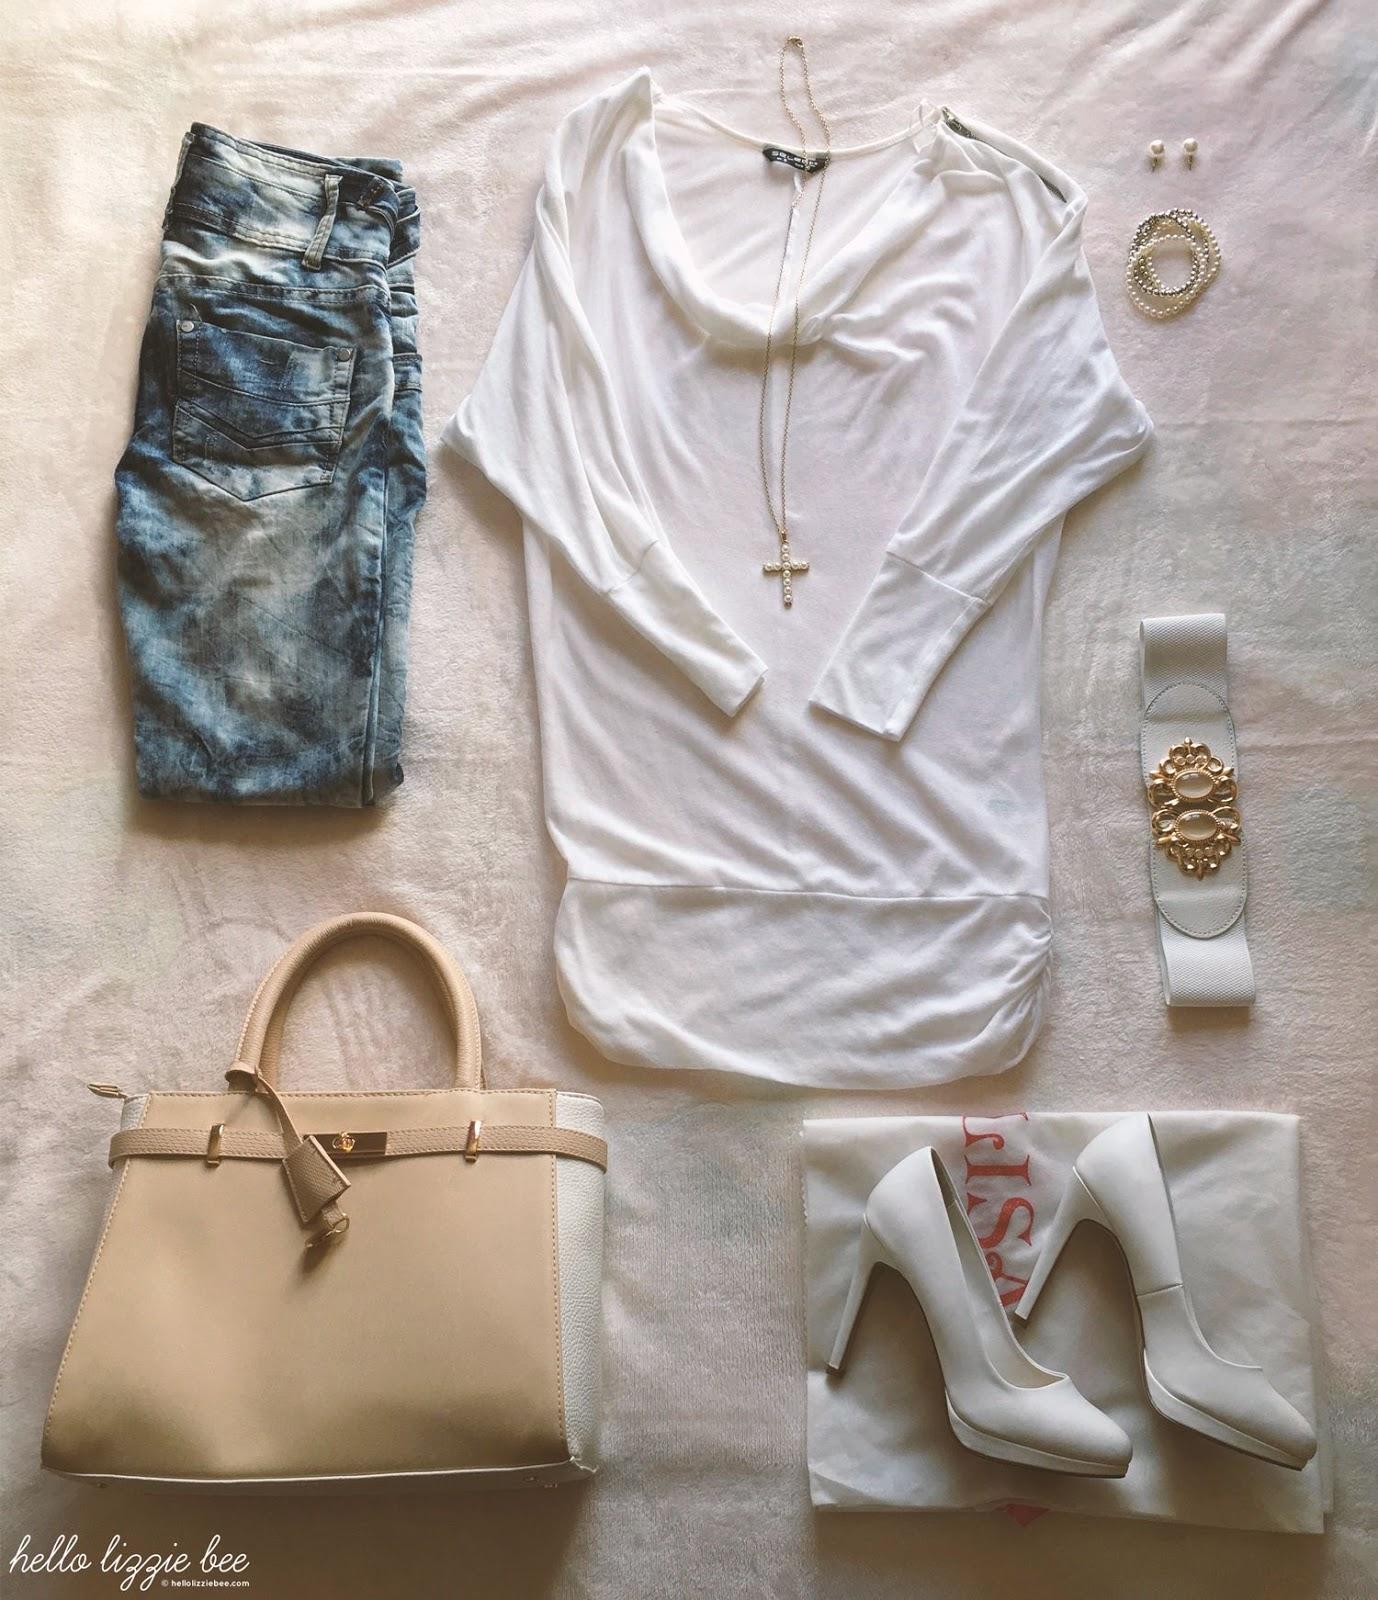 ane gyaru outfit